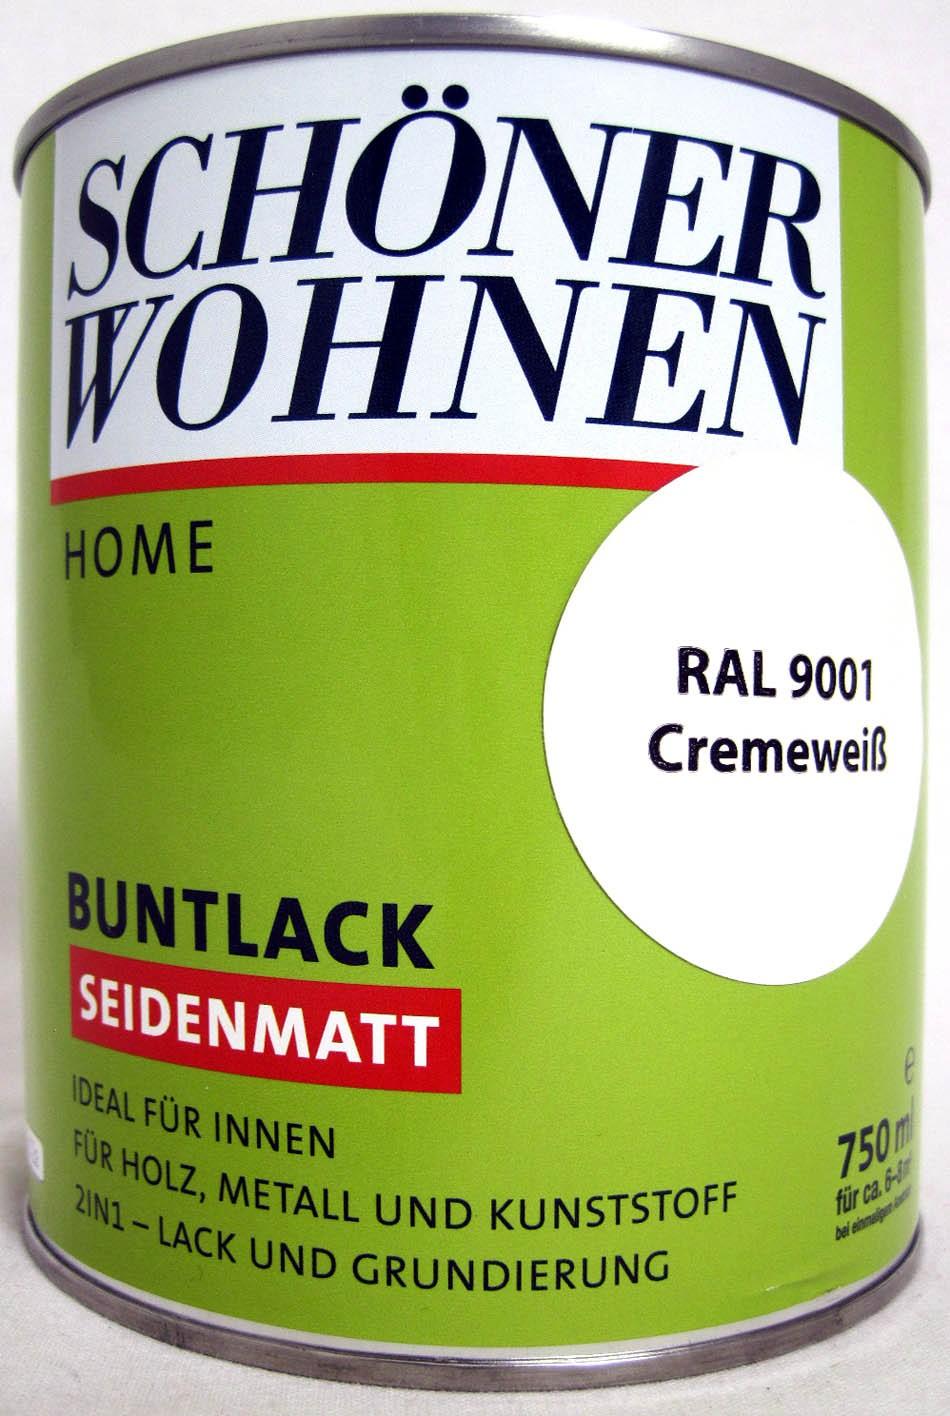 Home Buntlack - Acryllack, seidenmatt, RAL 9001 cremeweiß, 750 ml